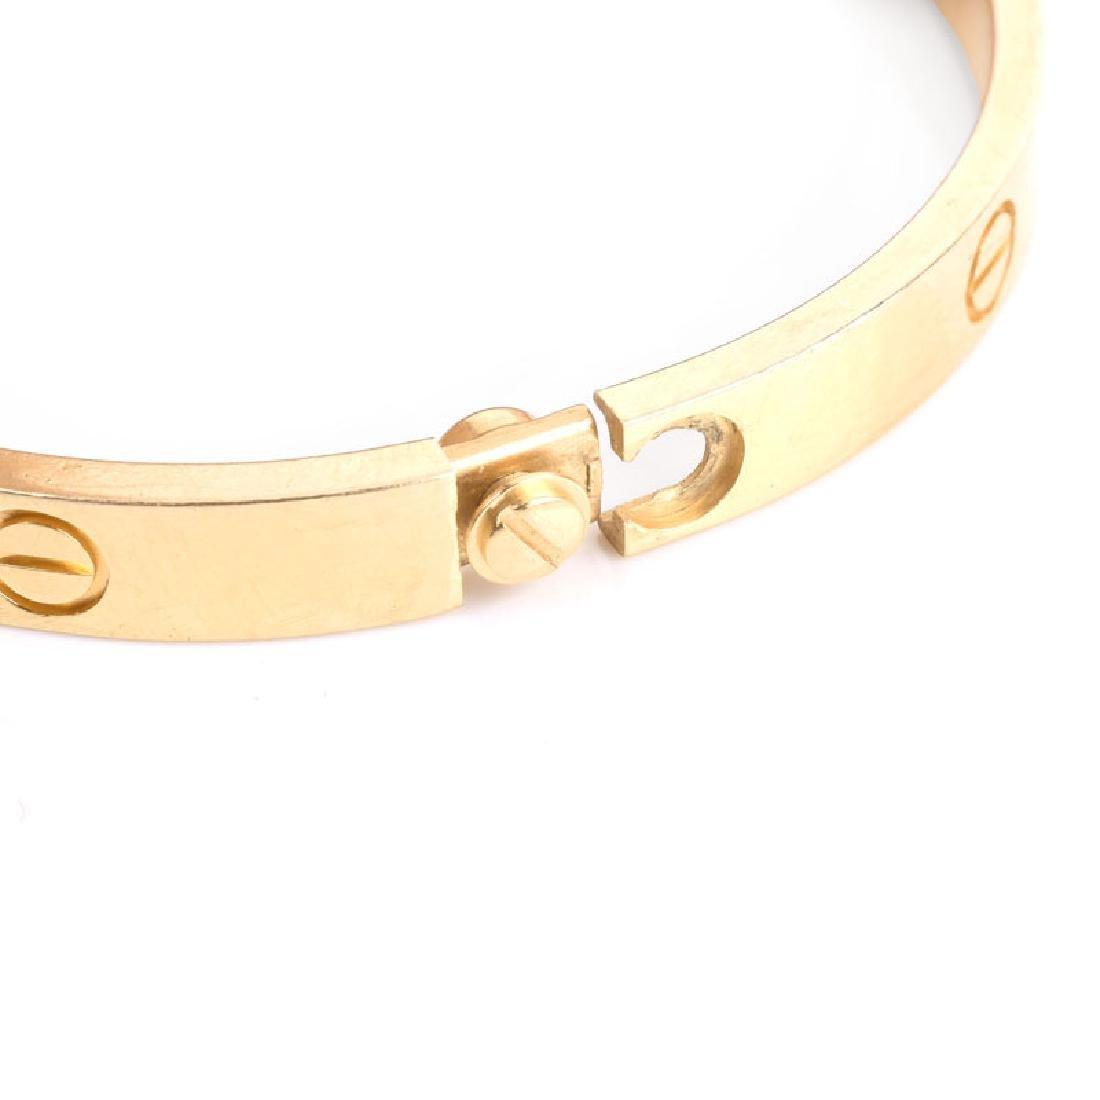 Circa 2014 Cartier 18 Karat Yellow Gold Love Bracelet - 5